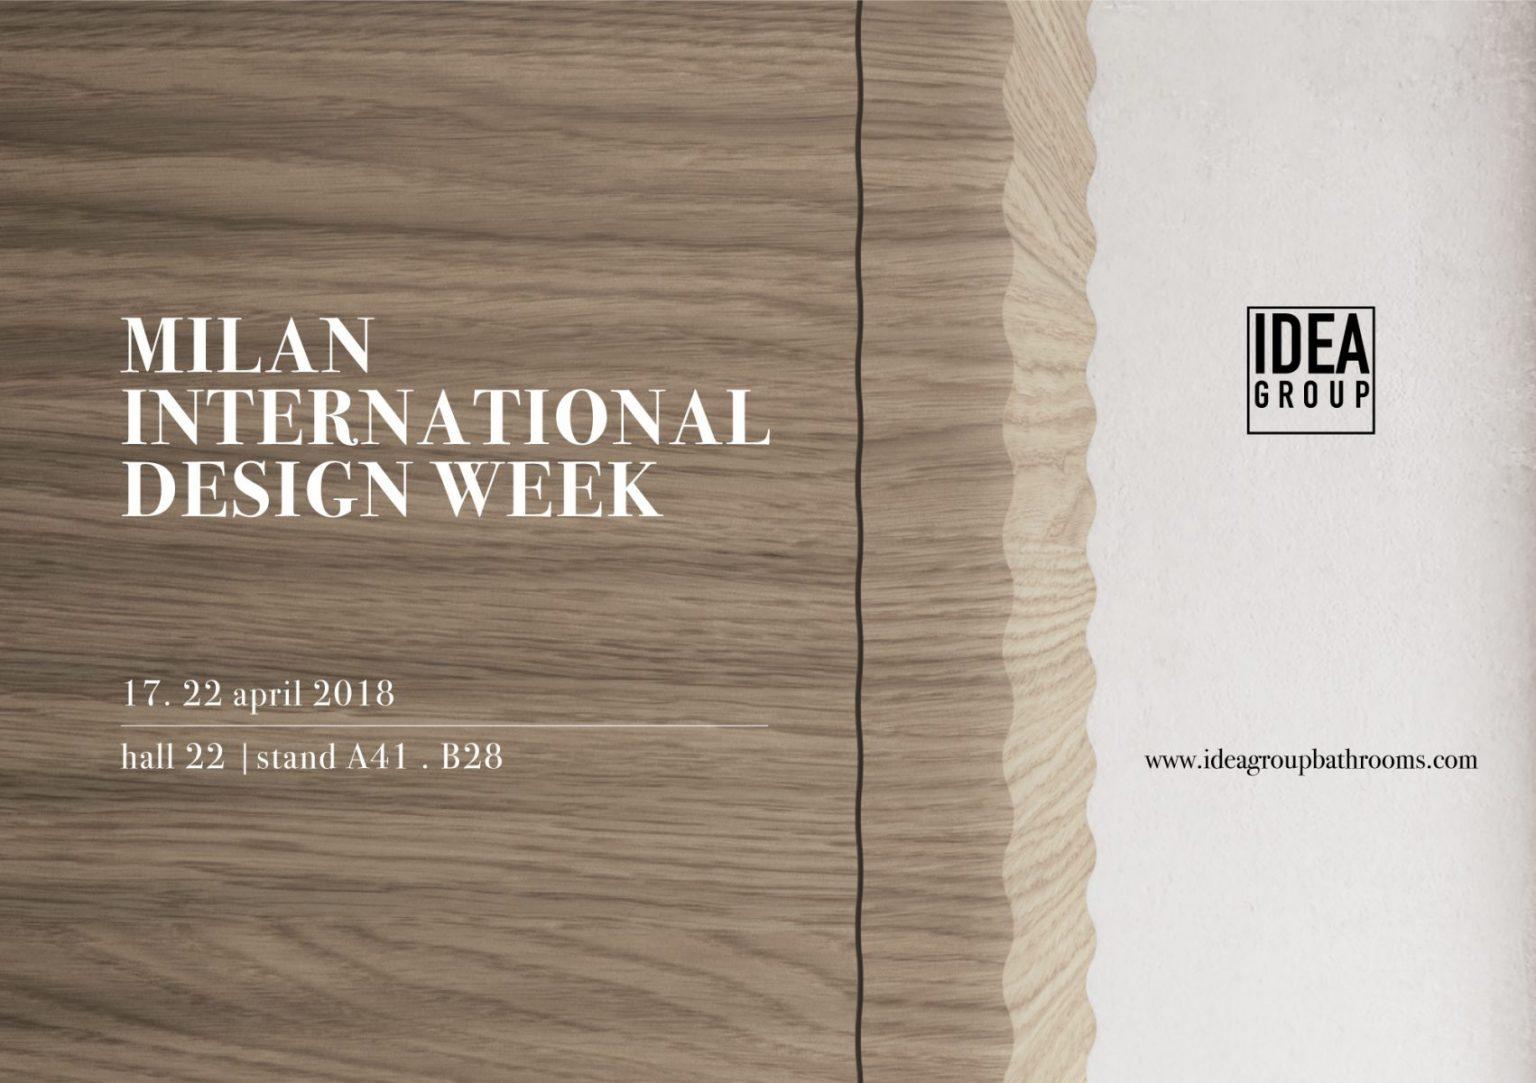 Ideagroup at the Milan 2018 International Bathroom Exhibition